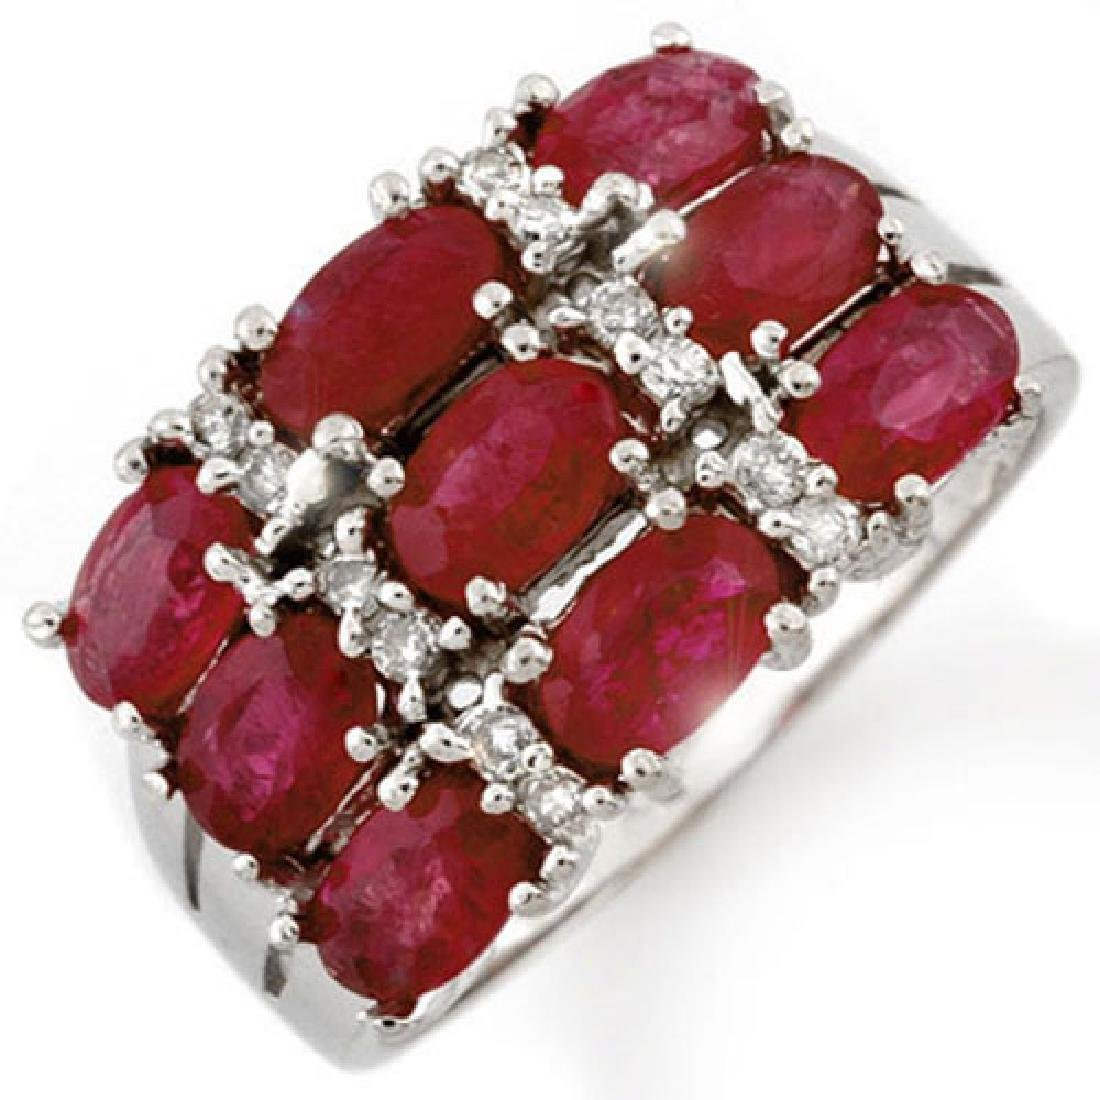 3.15 CTW Ruby & Diamond Ring 18K White Gold